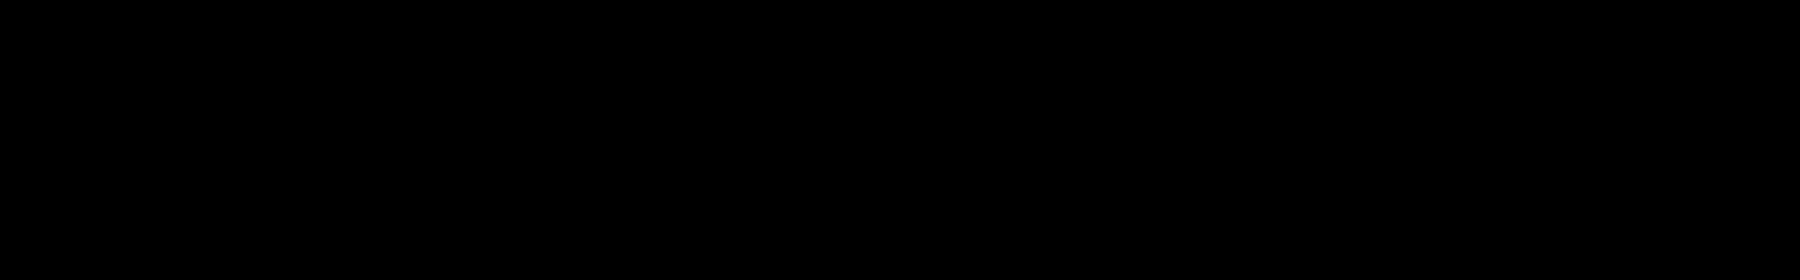 LIBRA audio waveform